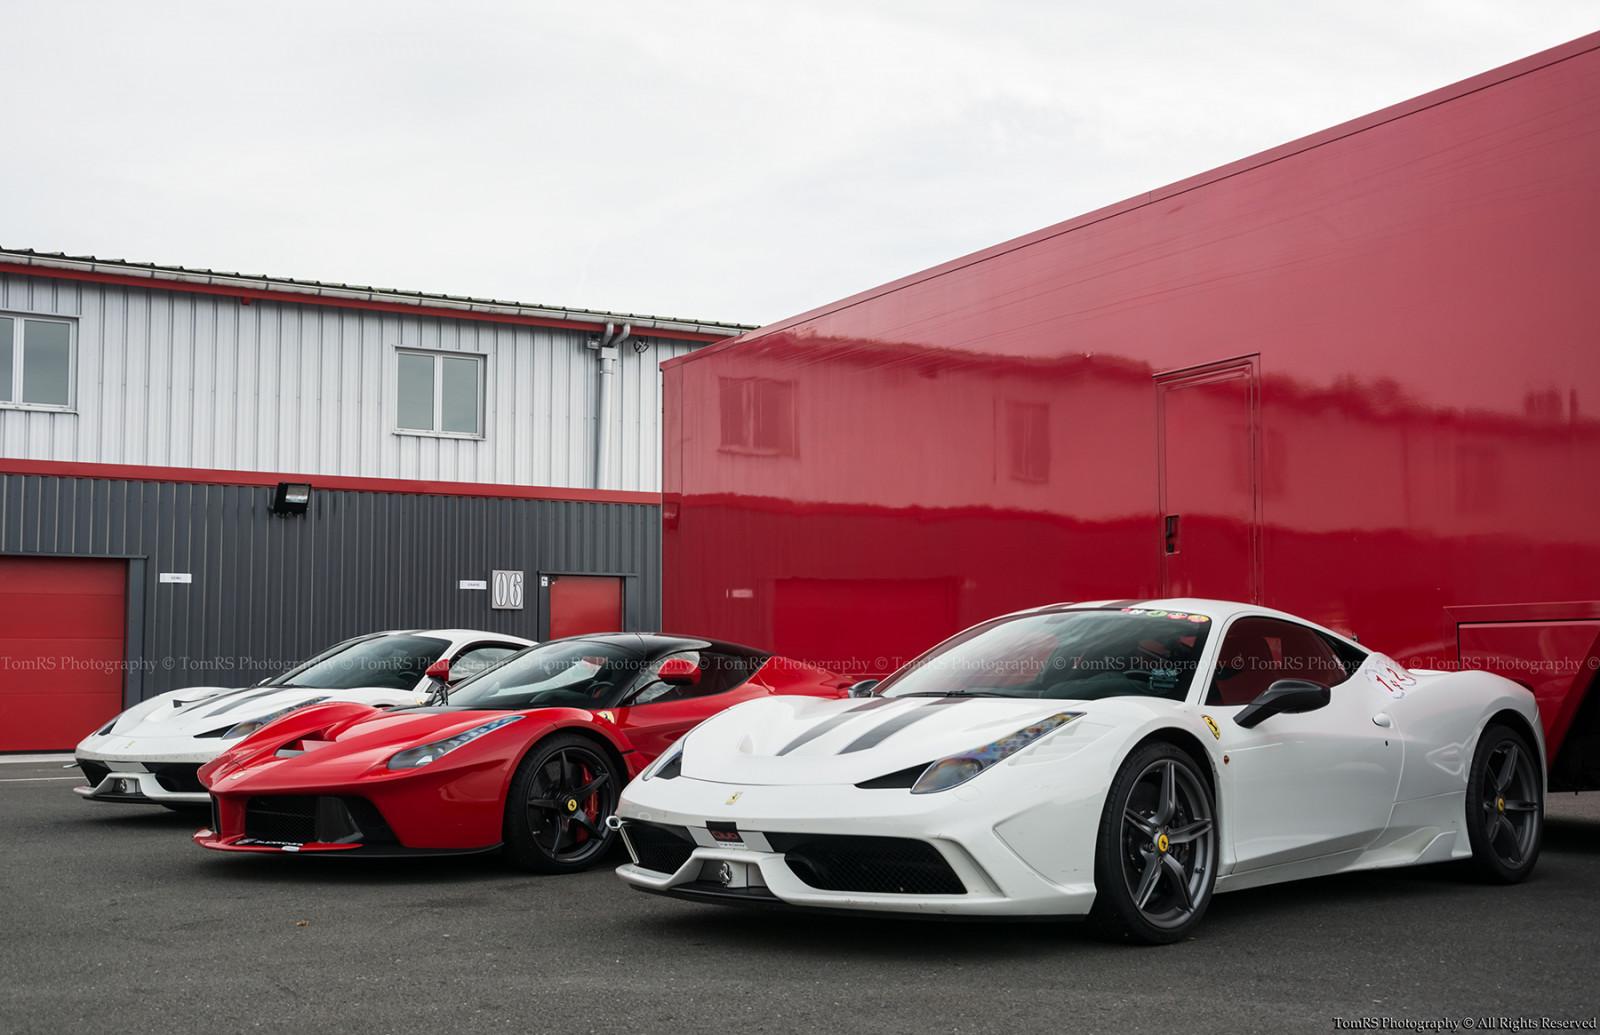 Wallpaper : street, love, road, supercars, sports car ...